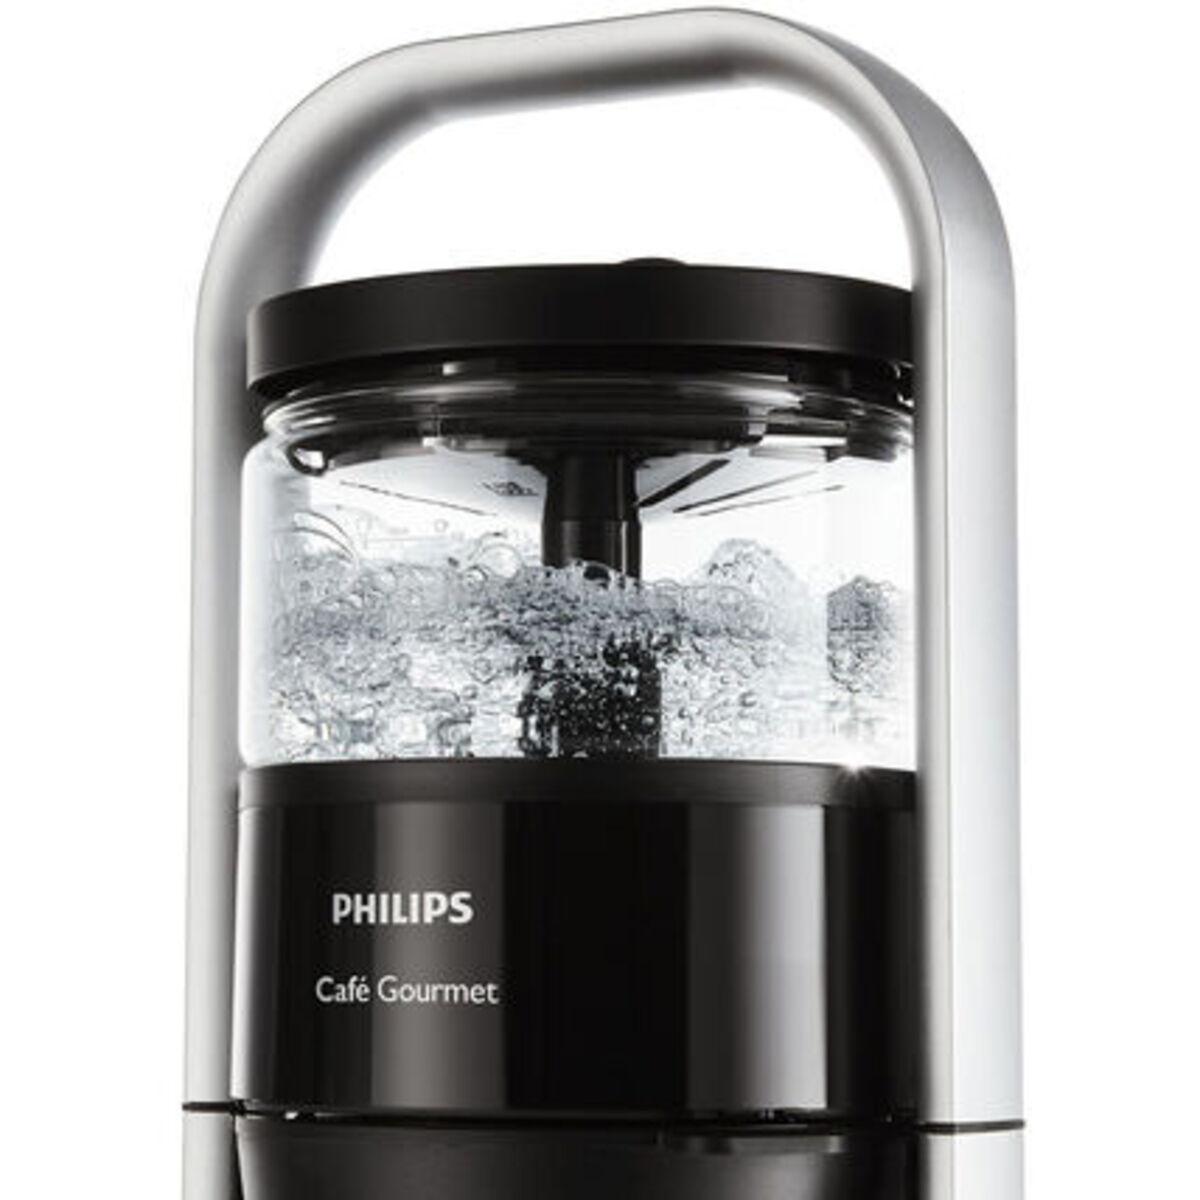 Bild 4 von Philips Kaffeeautomat Café Gourmet HD5408/60, schwarz/silber